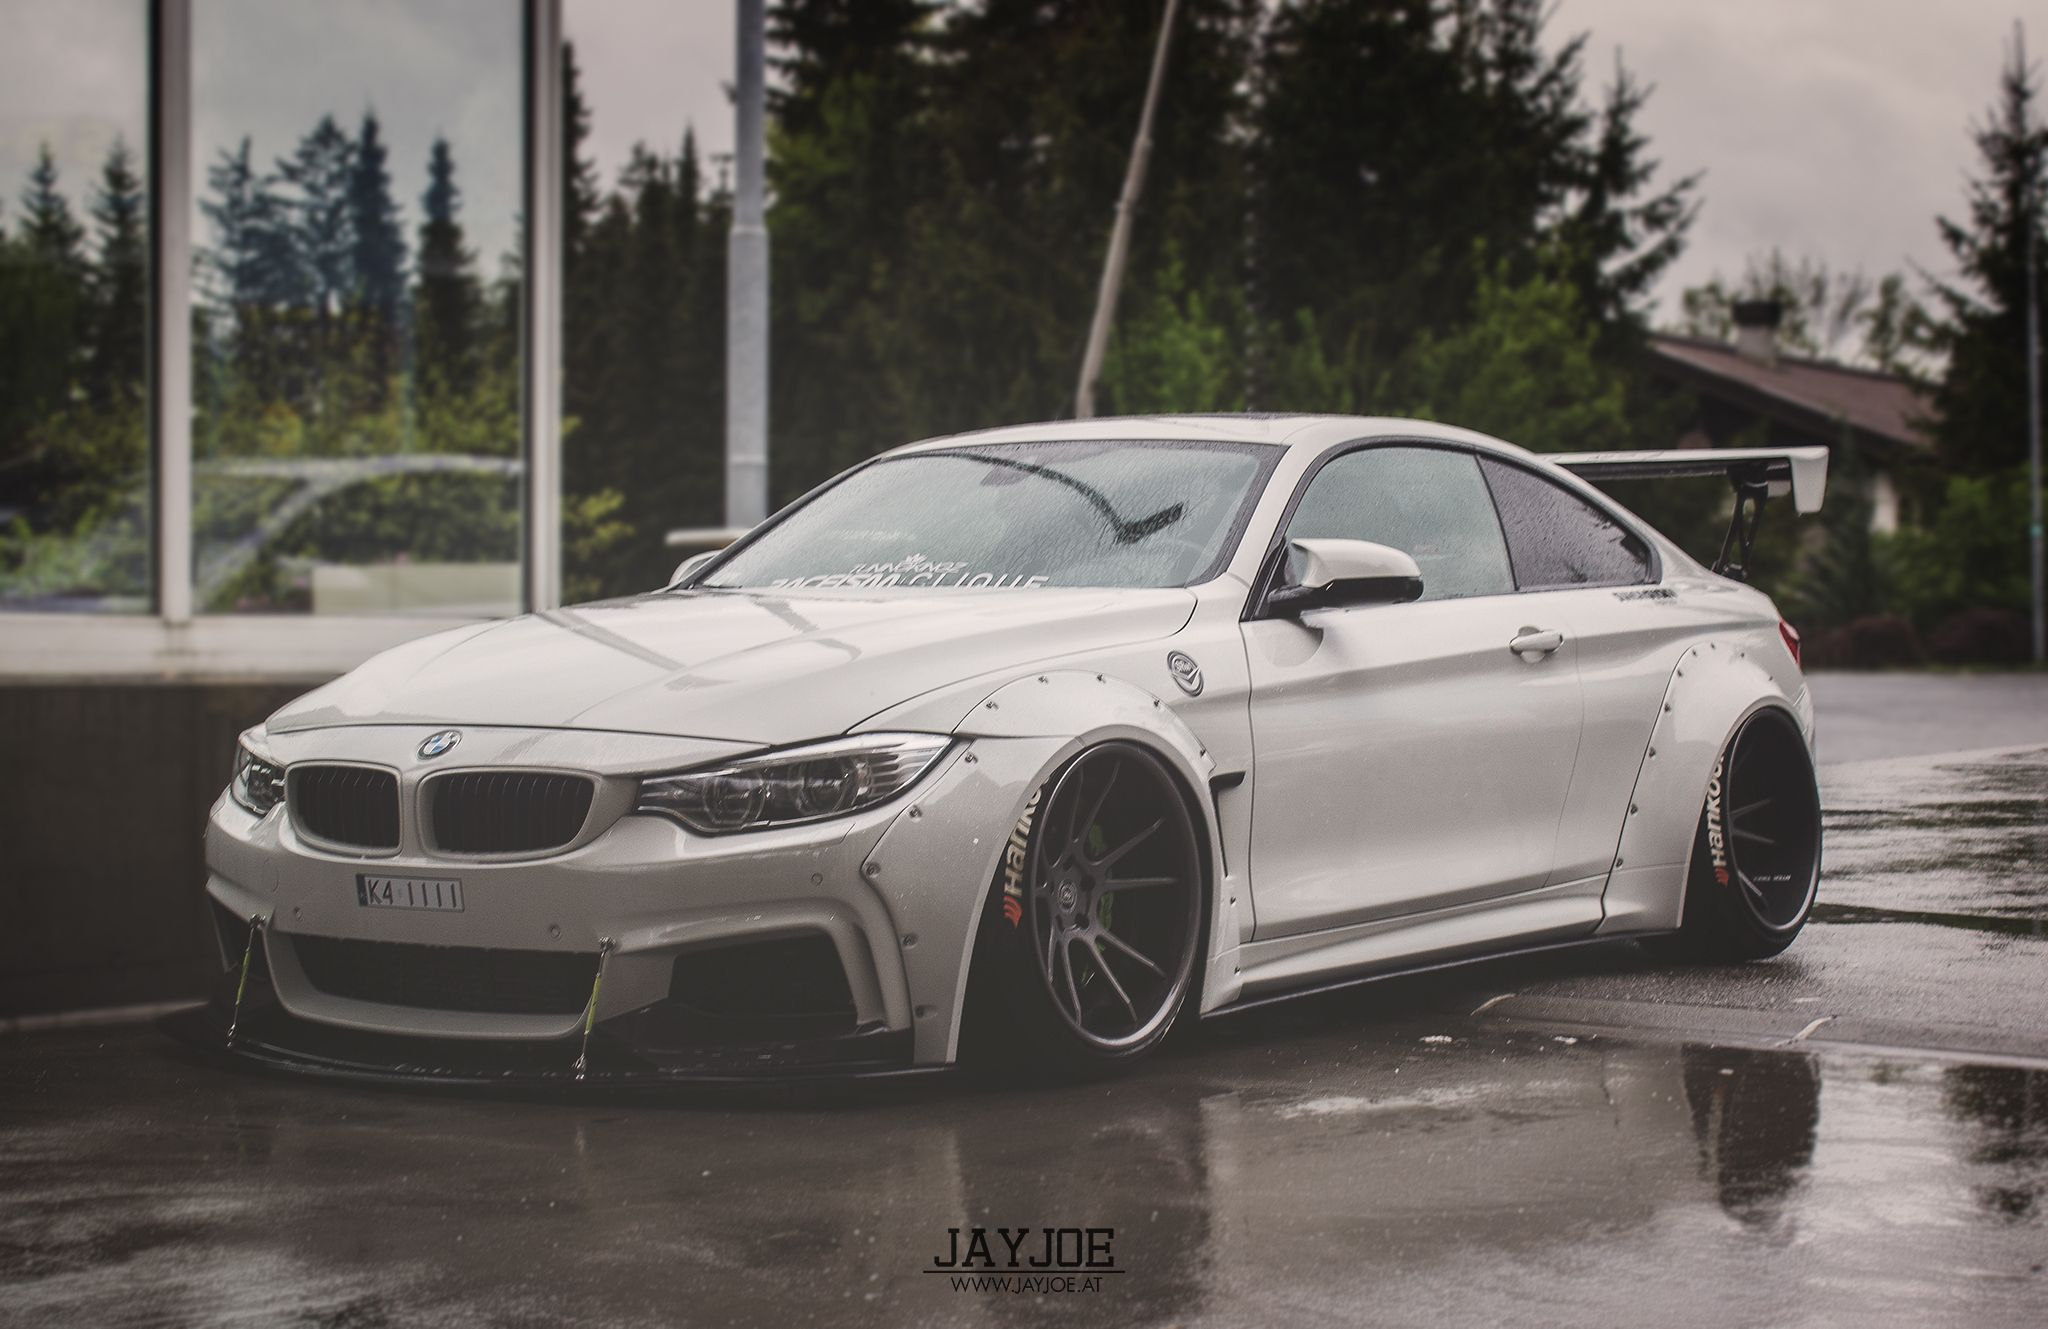 WSEE TOUR 2016 BMW 435i www.jayjoe.at SHOP http//jayjoe